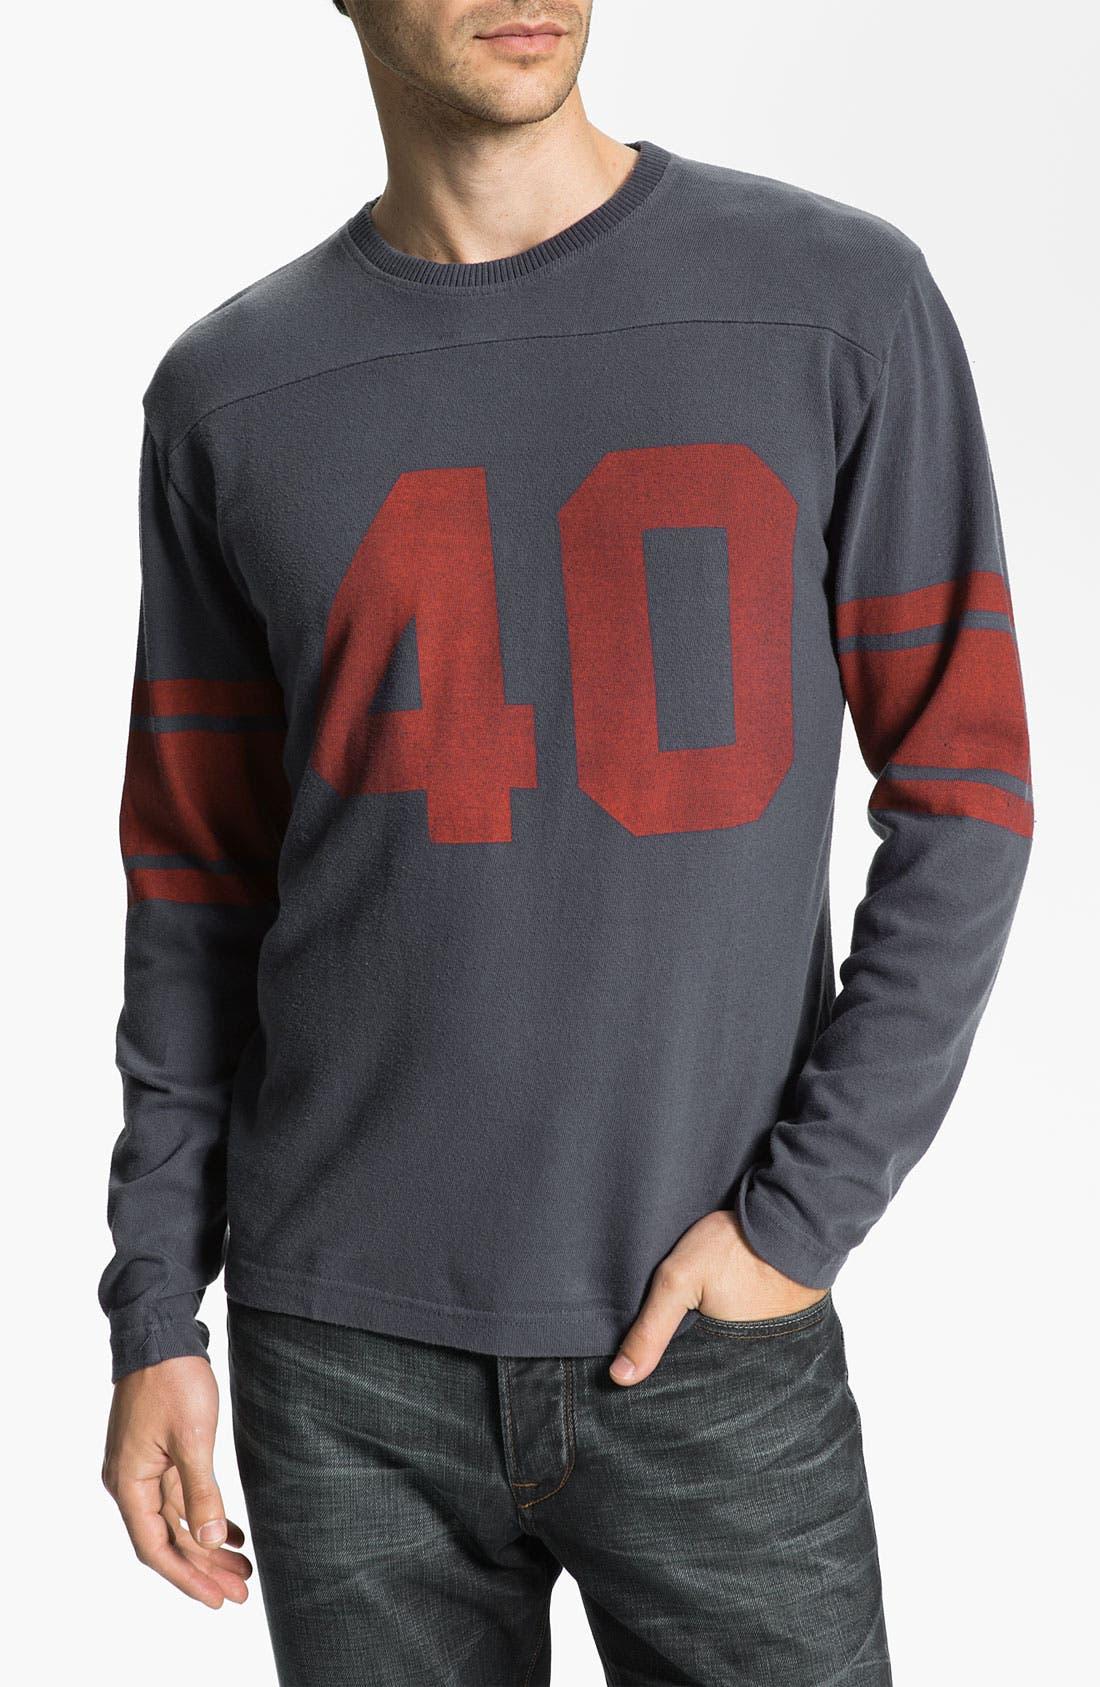 Alternate Image 1 Selected - Red Jacket 'Gale Sayers - Bulldog' Long Sleeve T-Shirt